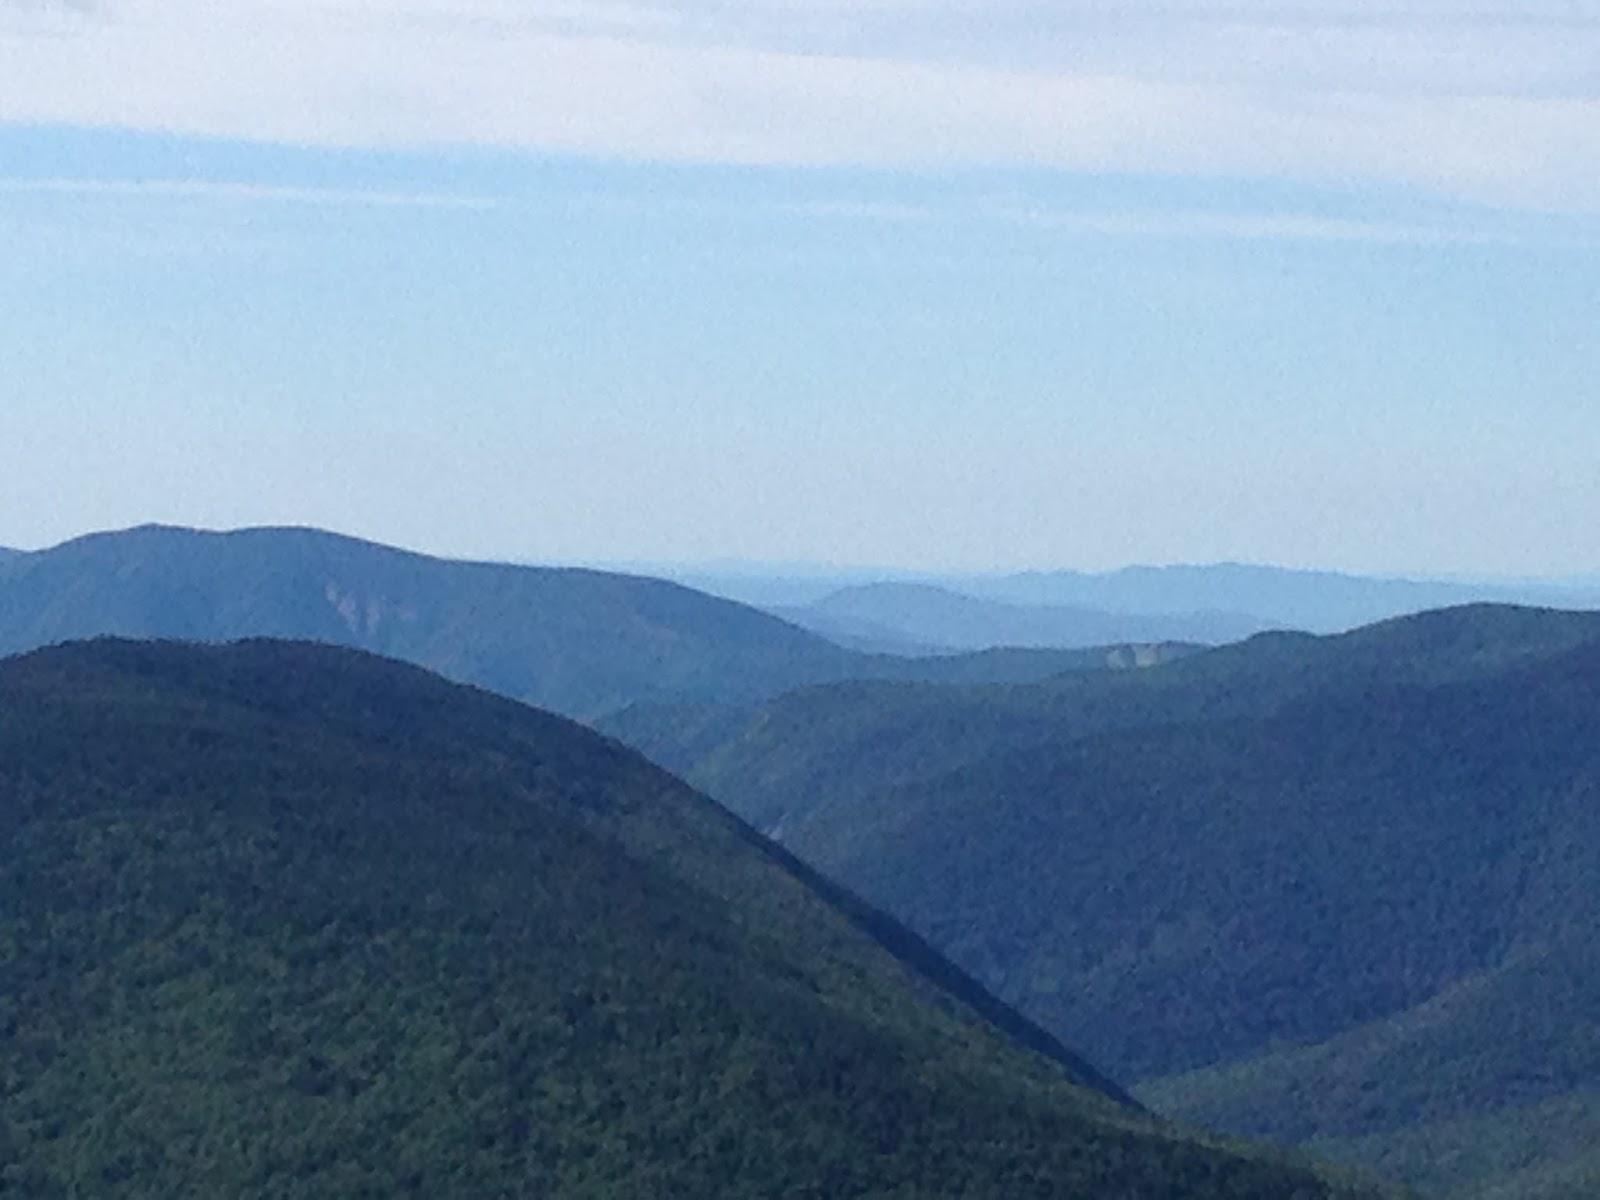 HockeyPucks hiking and highpointing: Mt  Garfield (4500